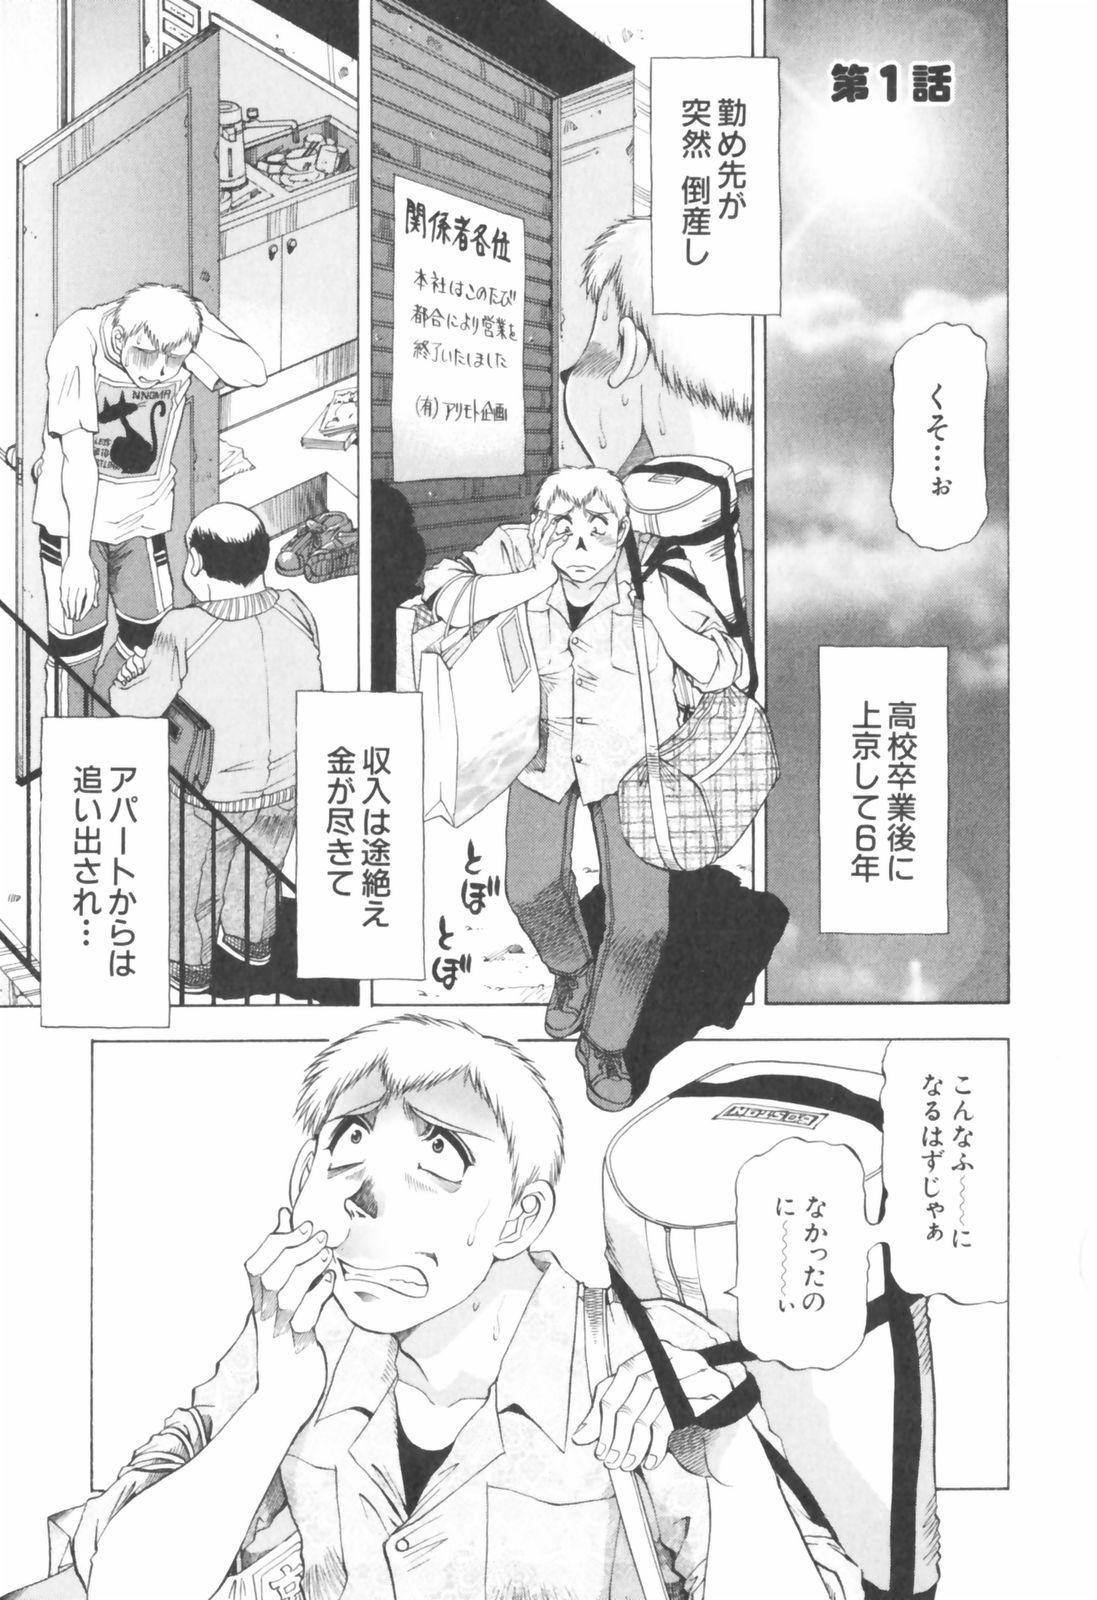 Doukyonin ni Onegai! 4